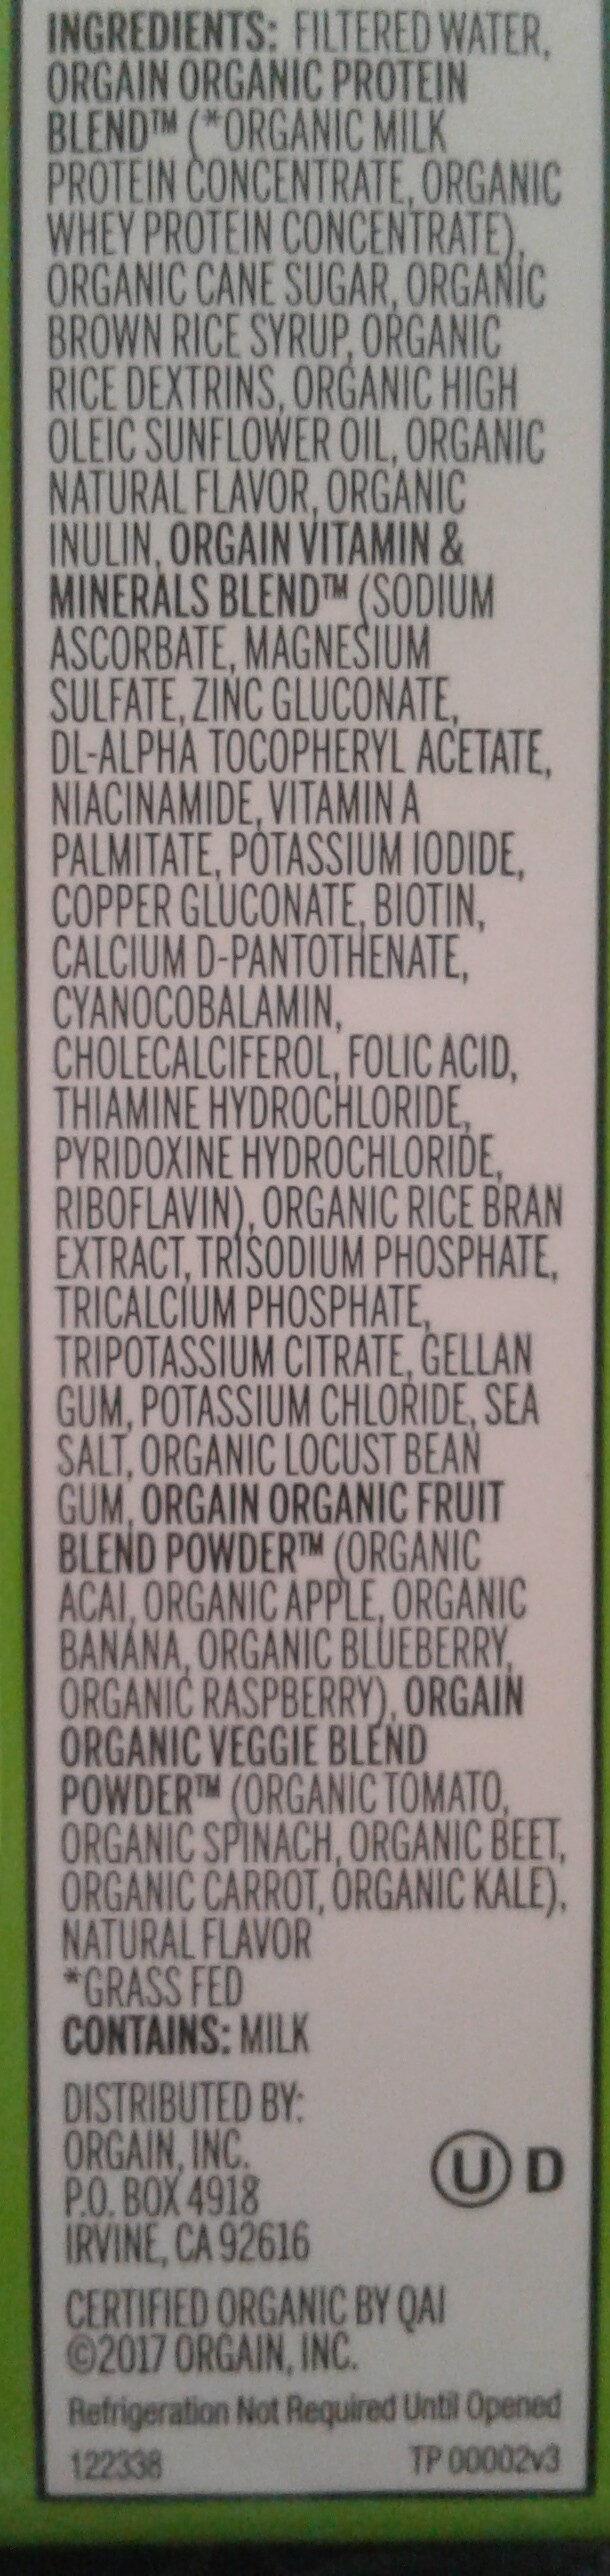 Sweet Vanilla Bean All-In-One Nutritional Shake - Ingredients